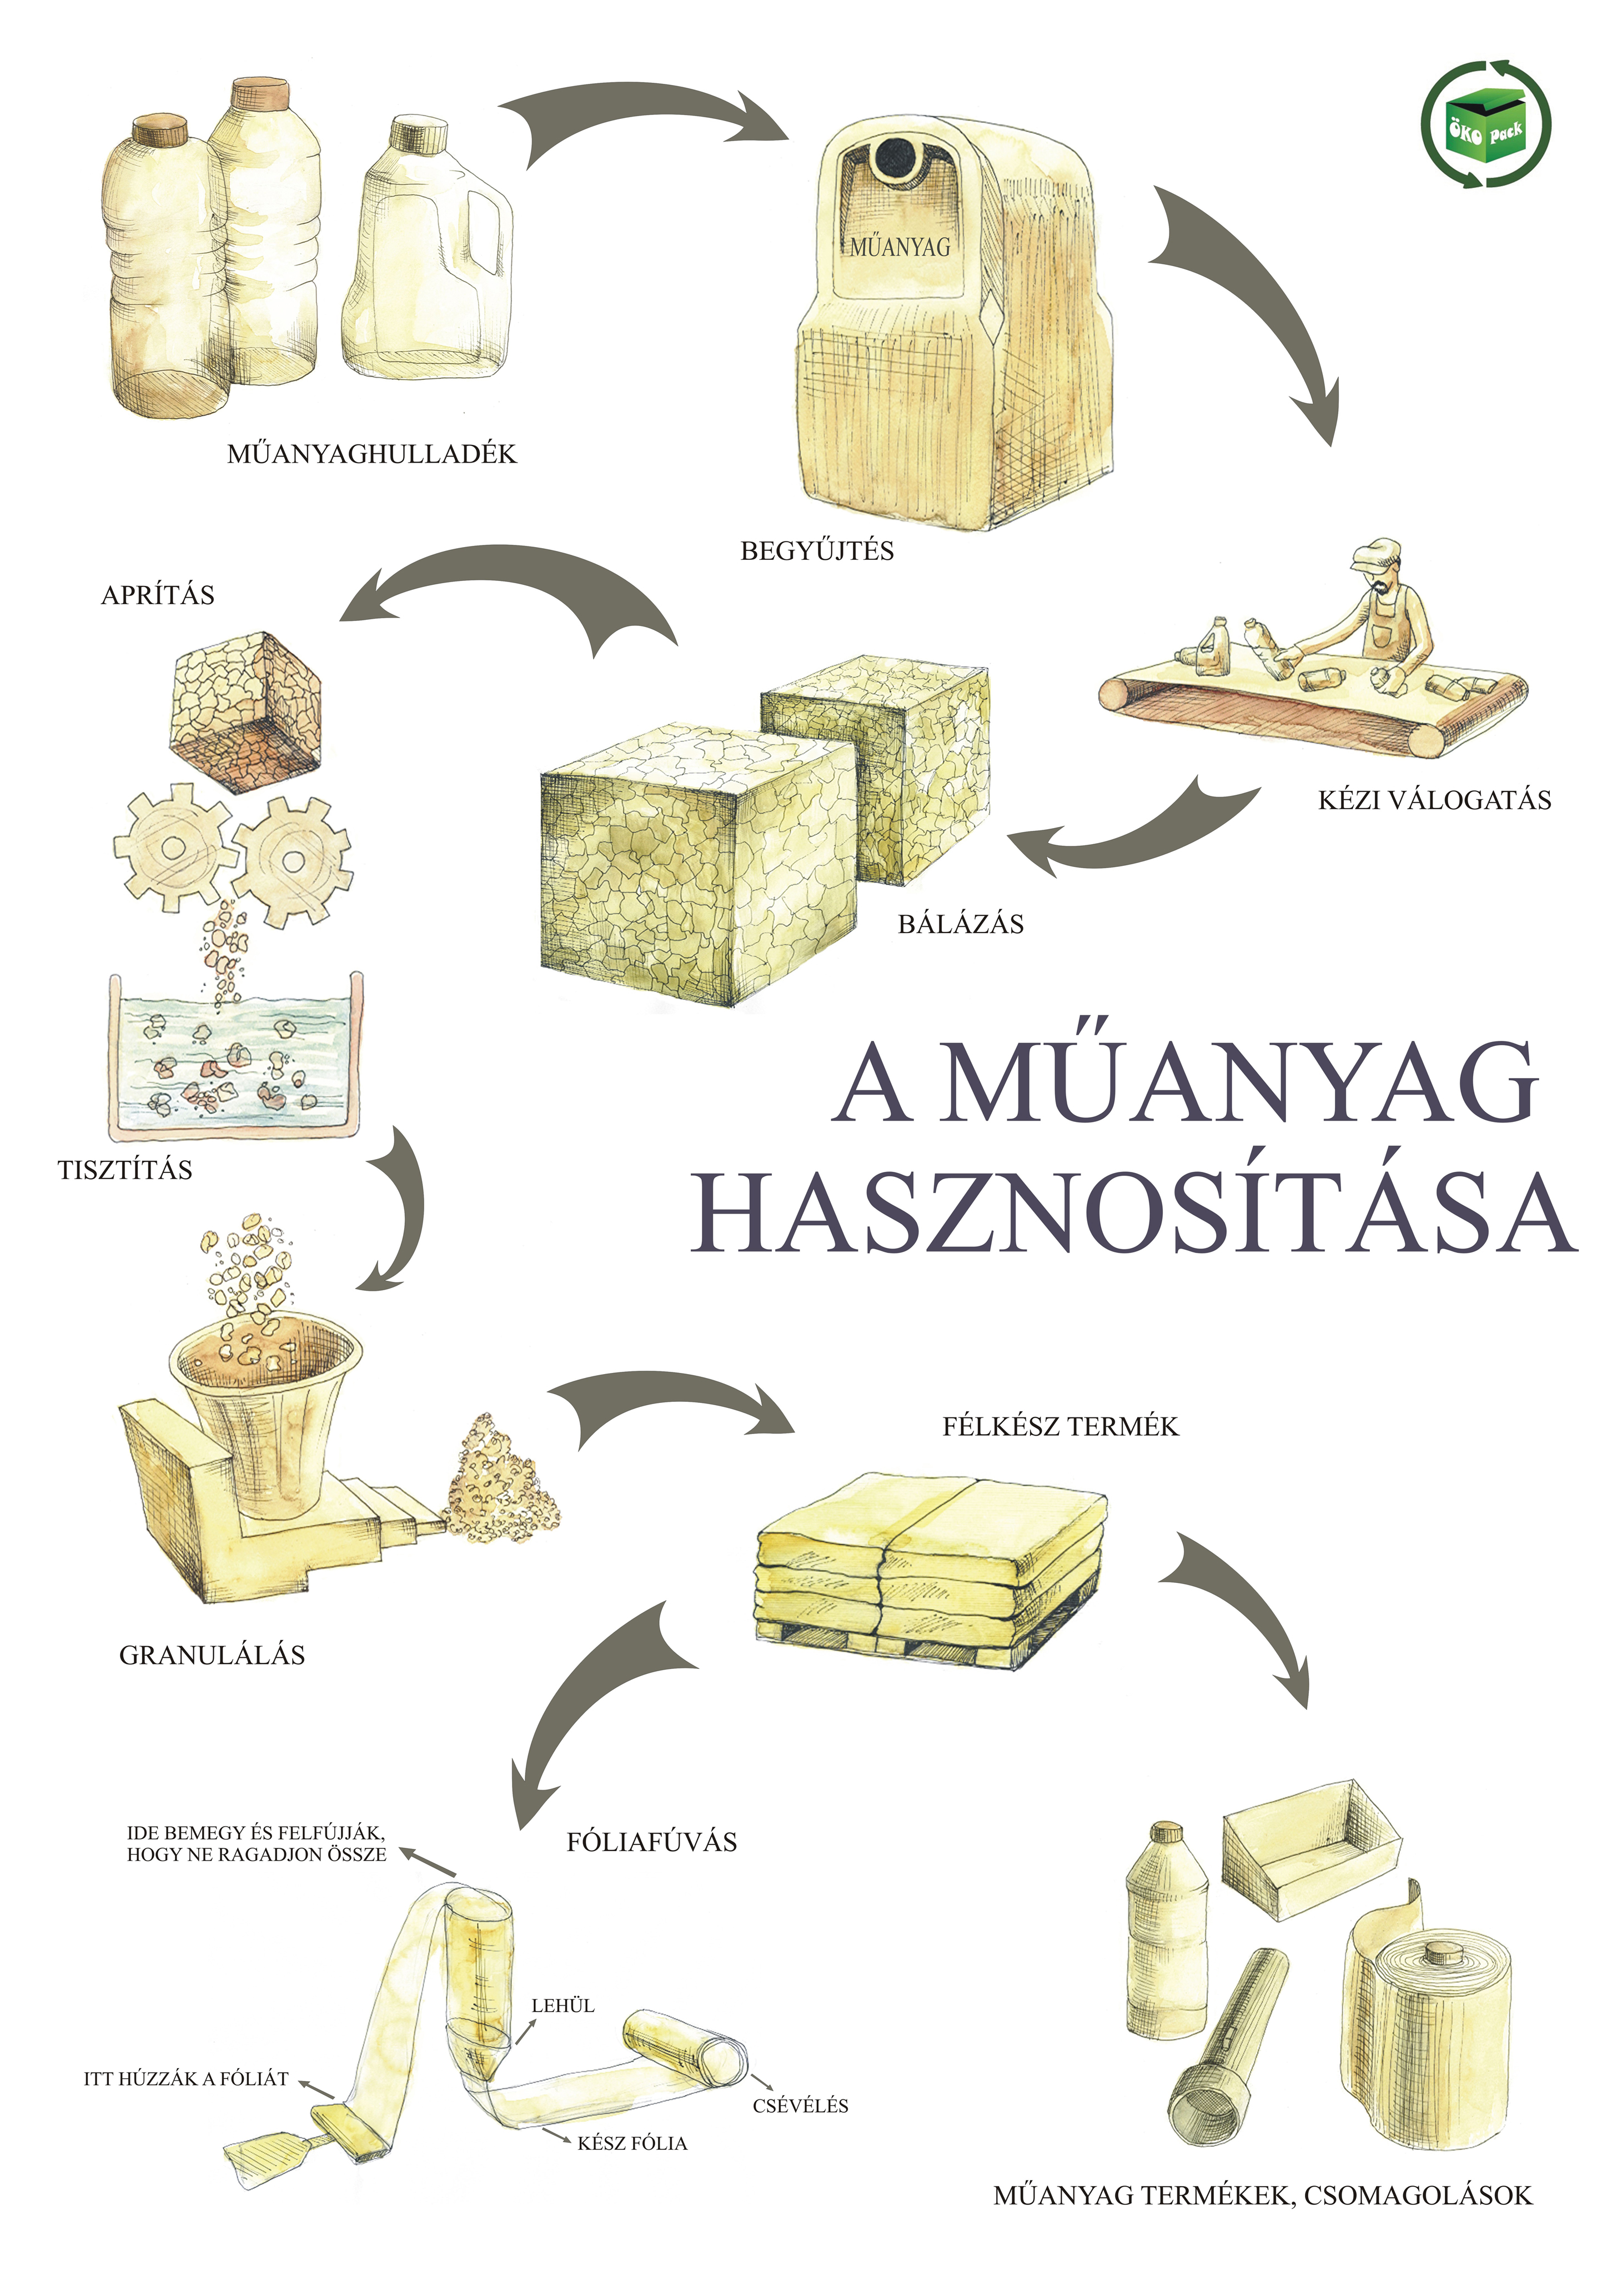 plakat_muanyag_hasznositas